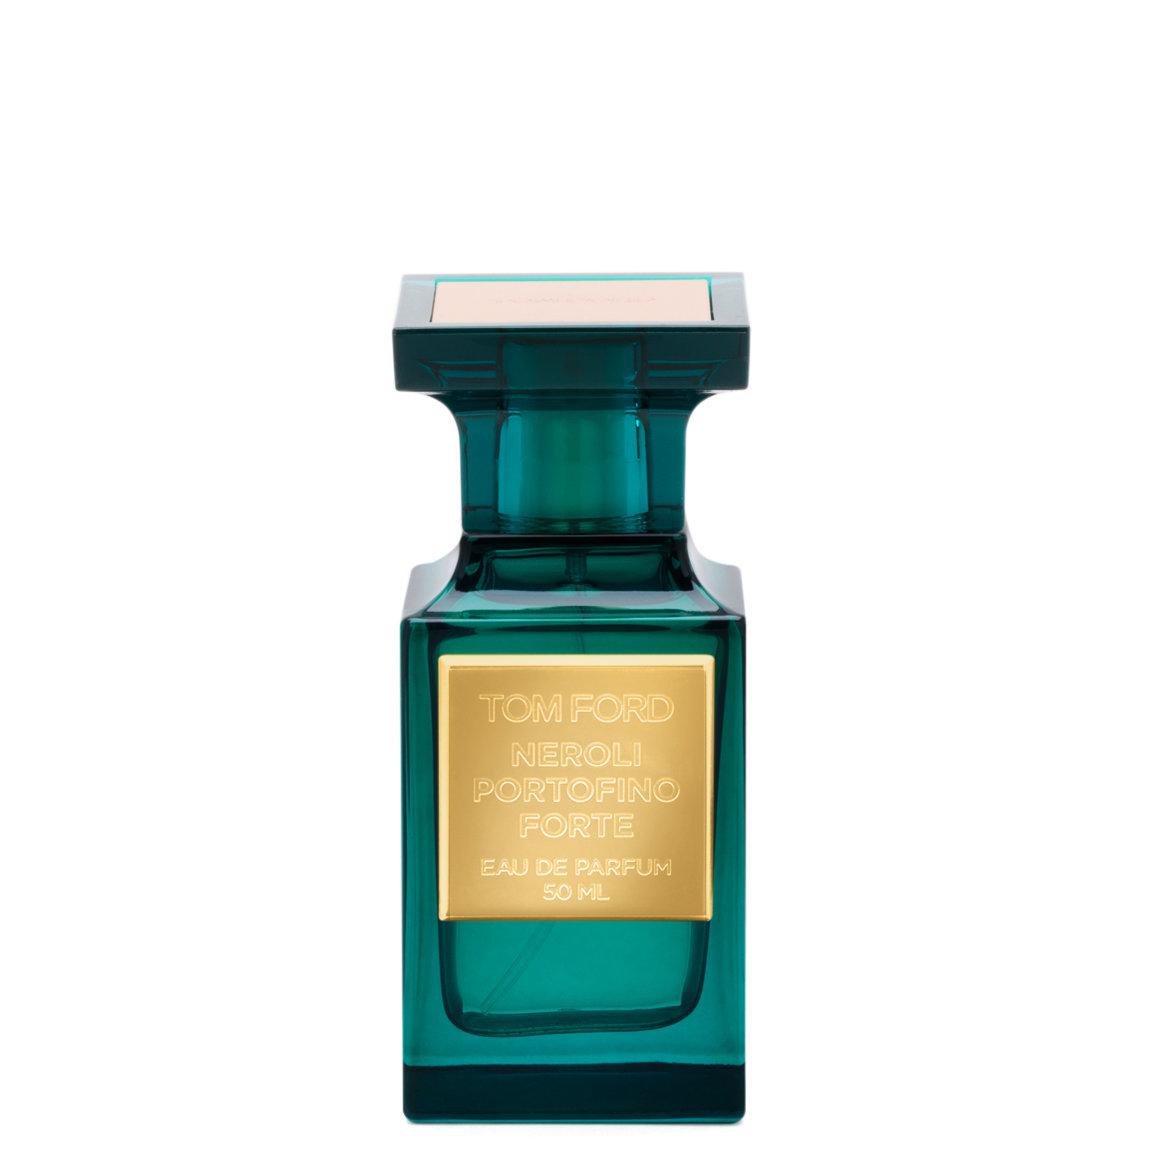 TOM FORD Neroli Portofino Forte 50 ml product swatch.